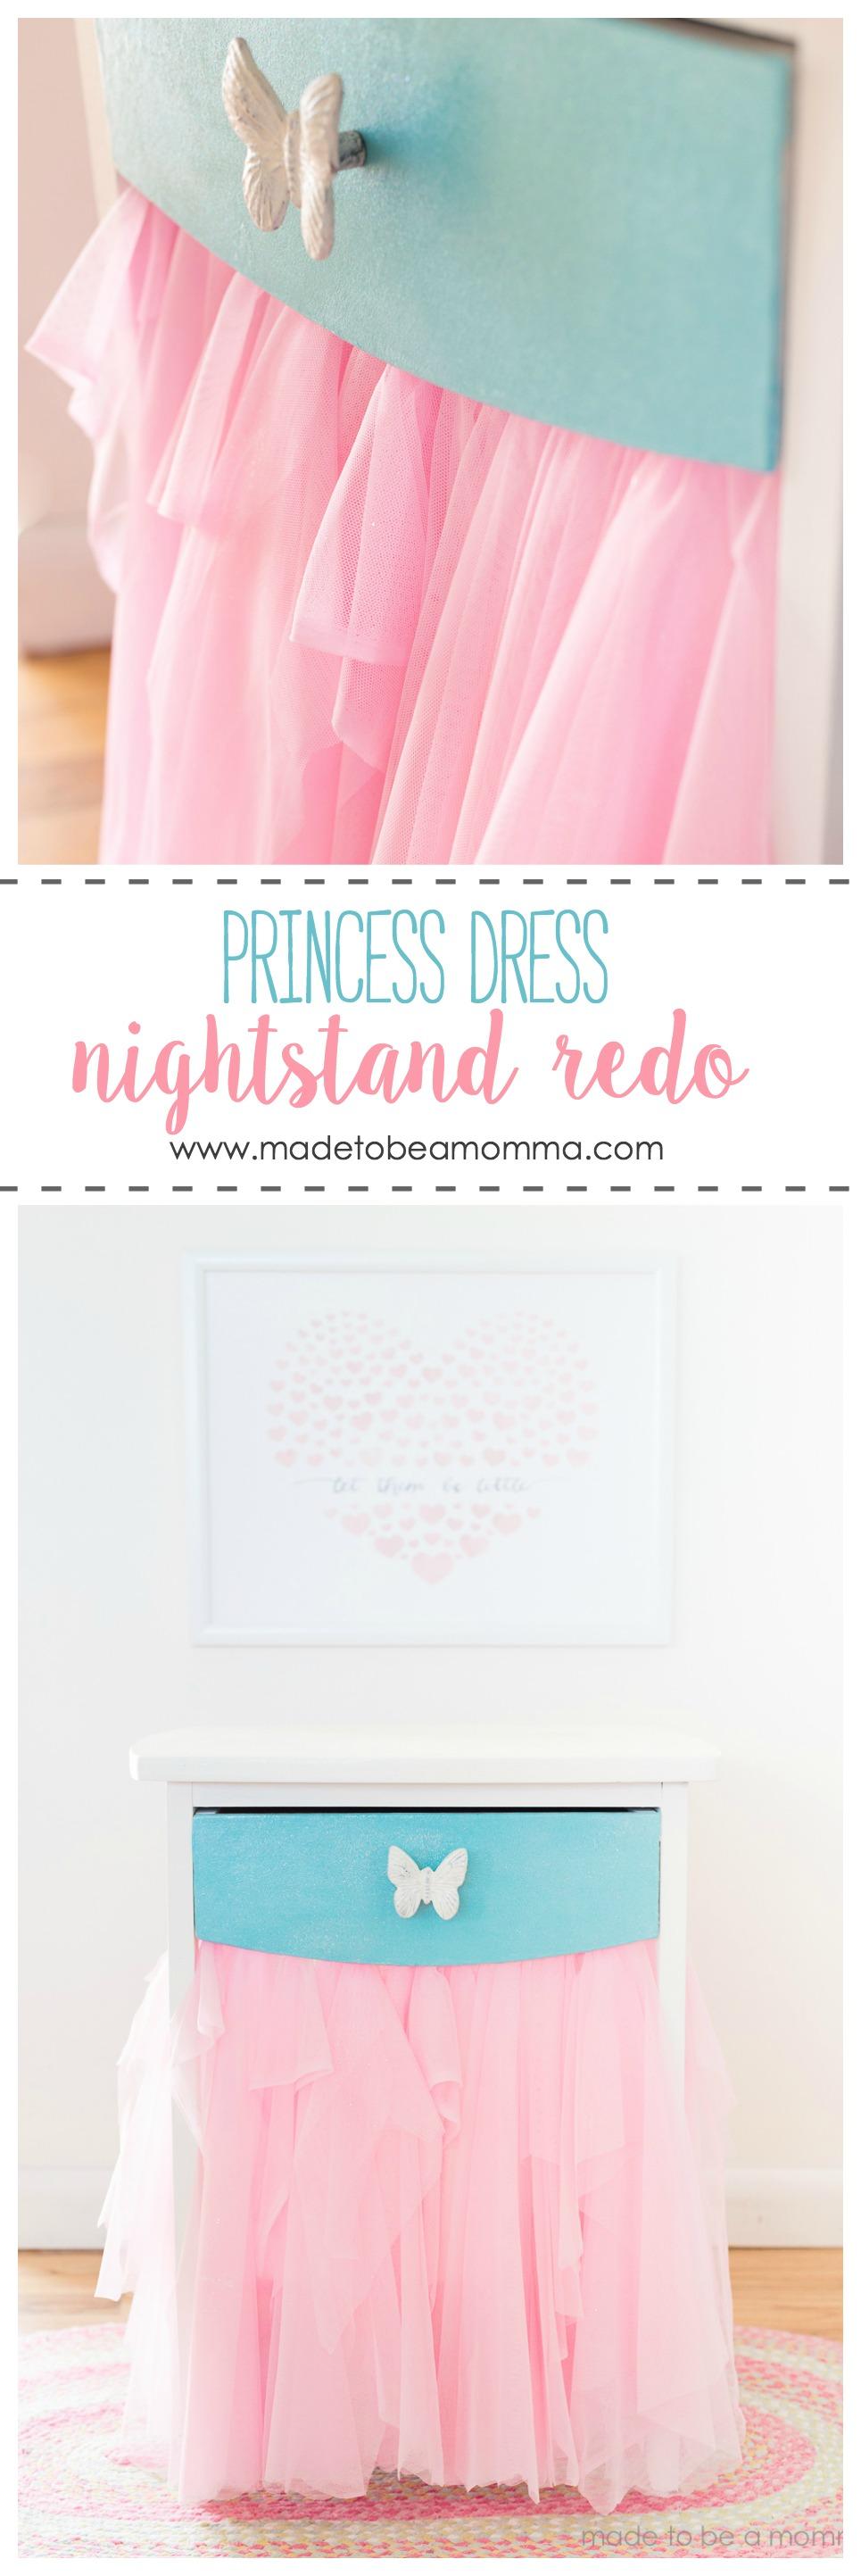 Princess Dress Nightstand Redo